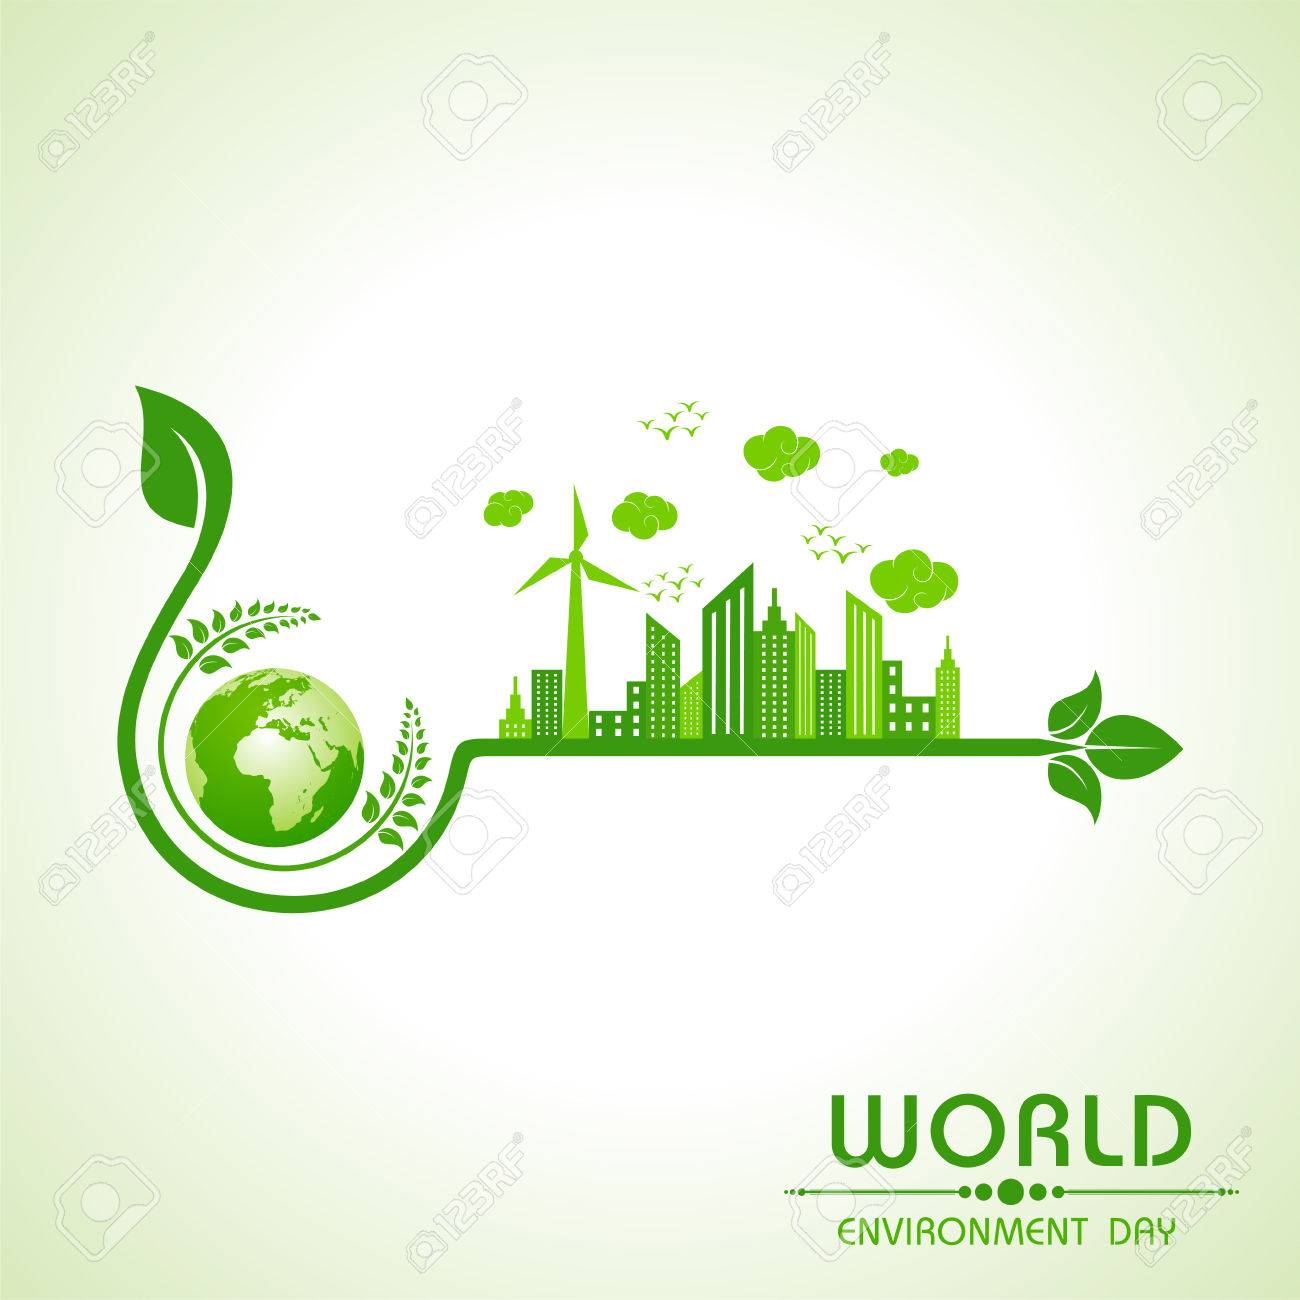 world environment day greeting design - 52486882